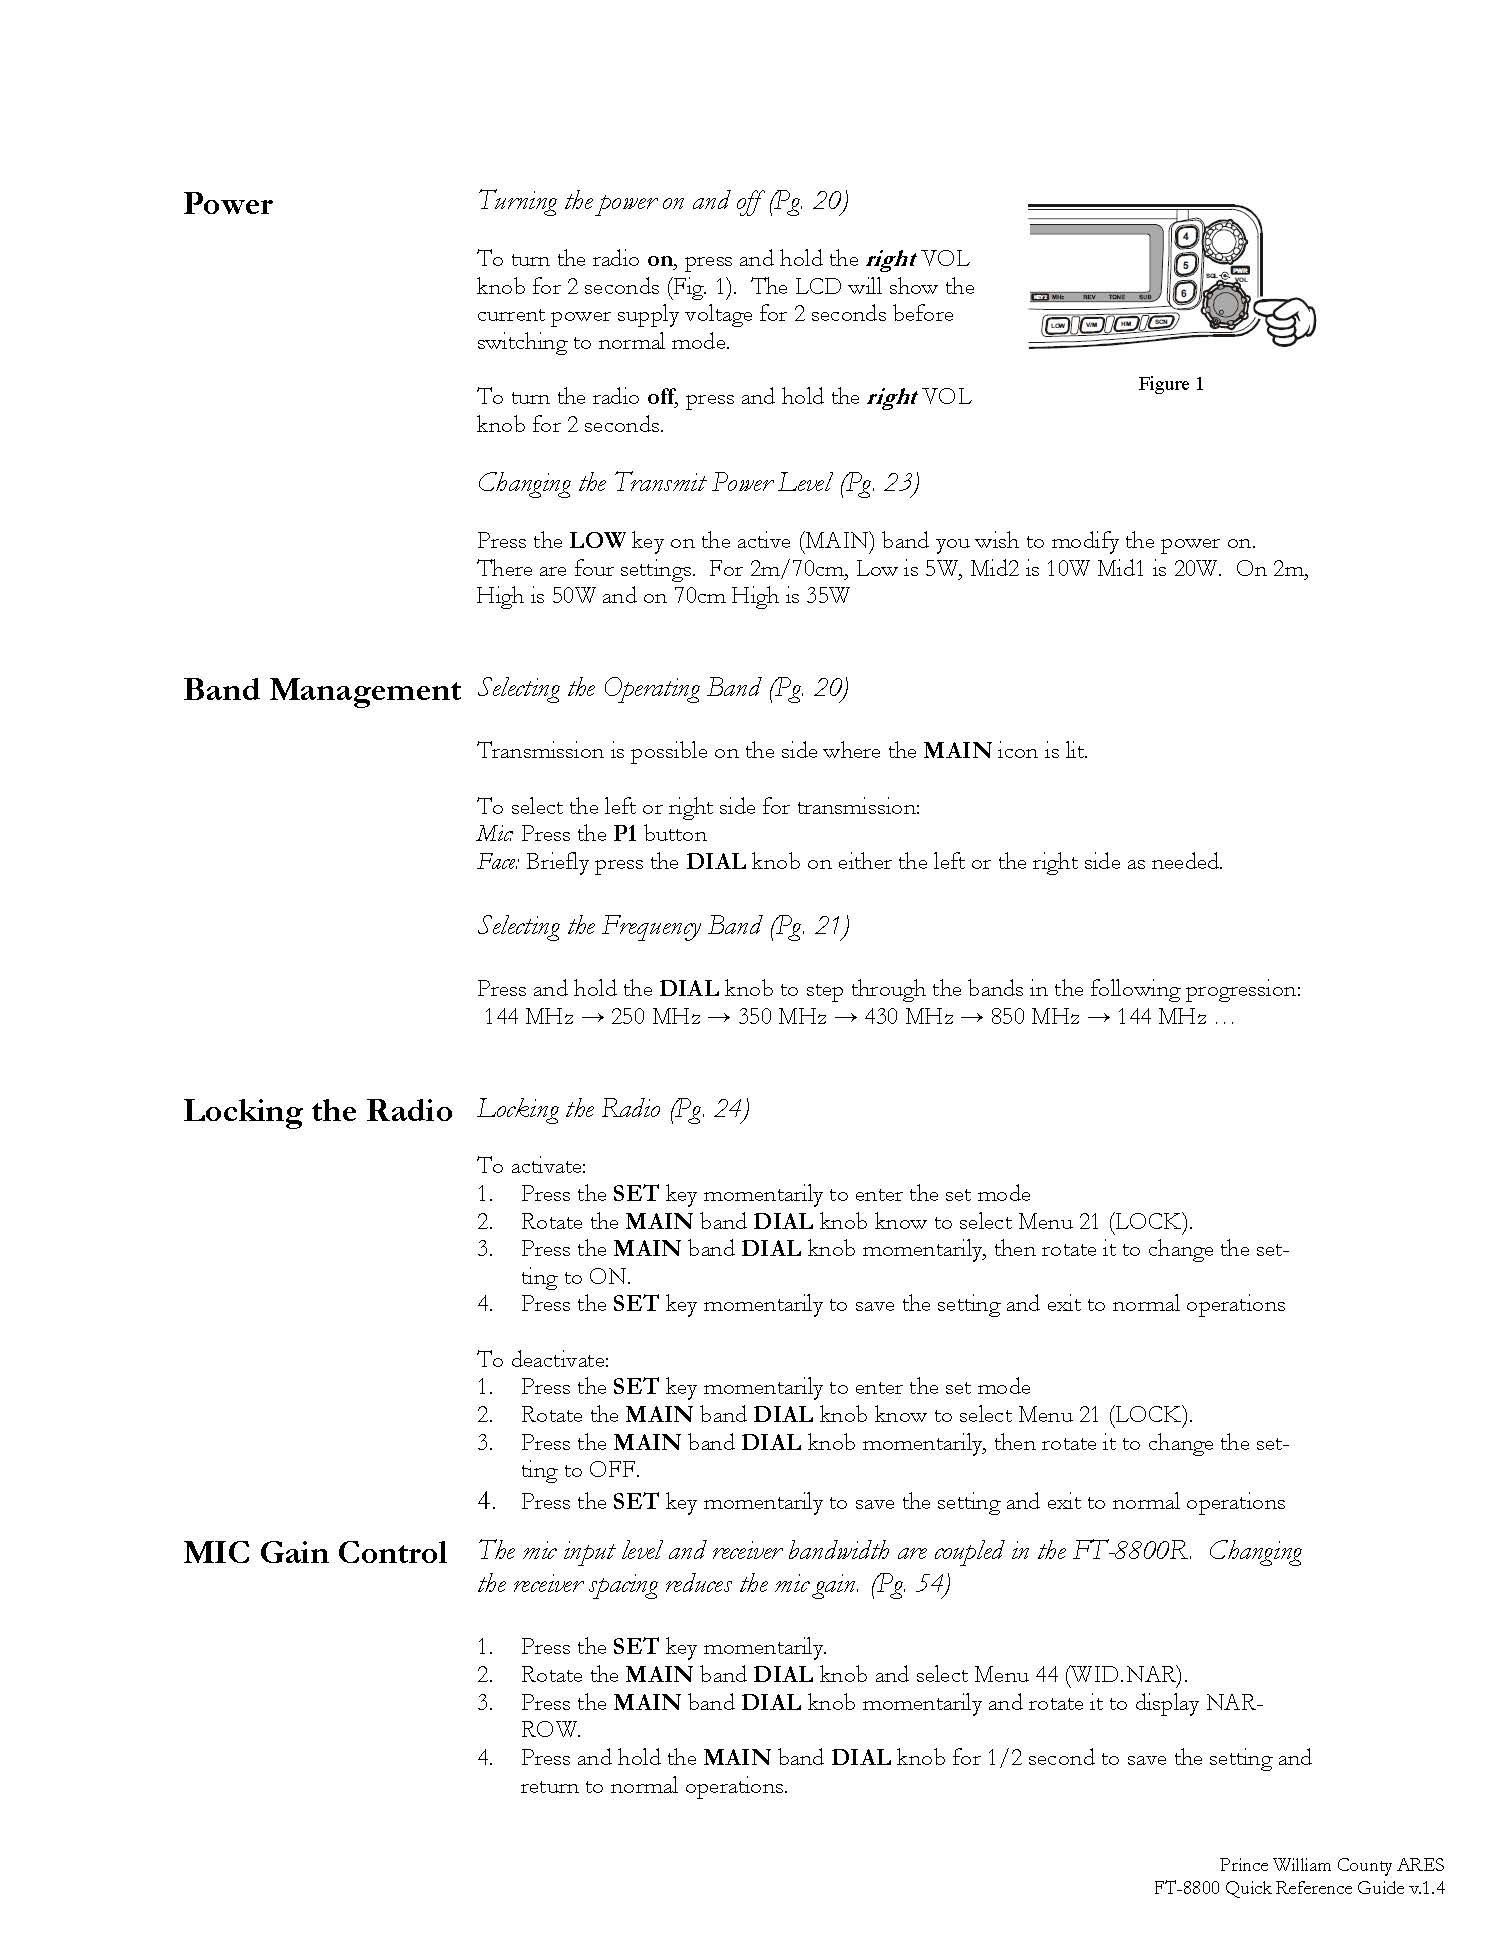 FT-8800 QRC Page 3